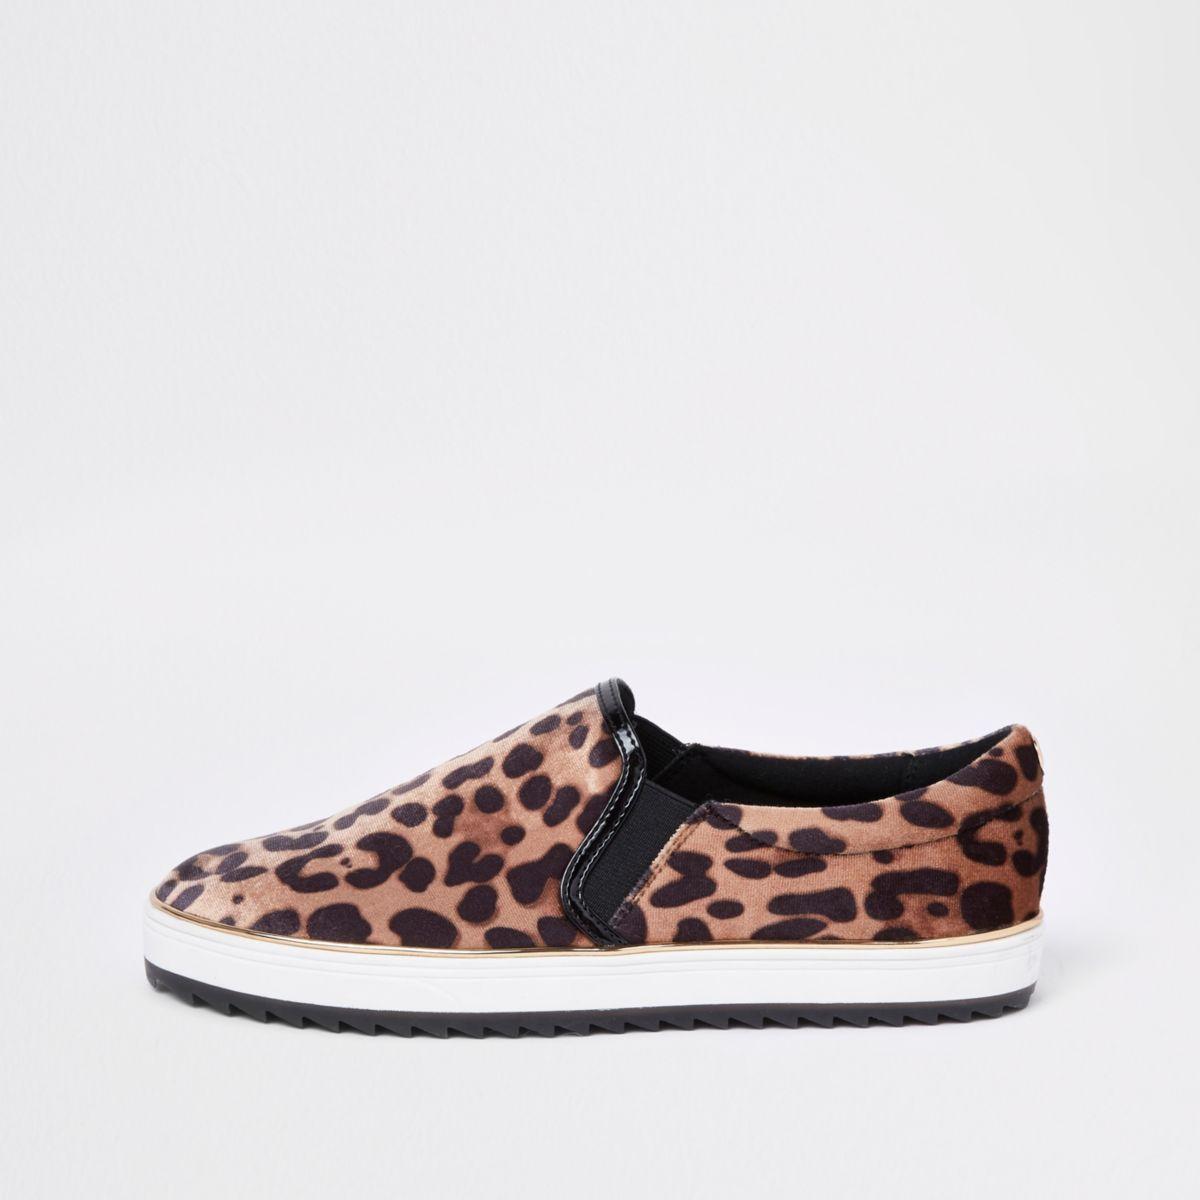 Brown leopard print slip on chunky plimsolls